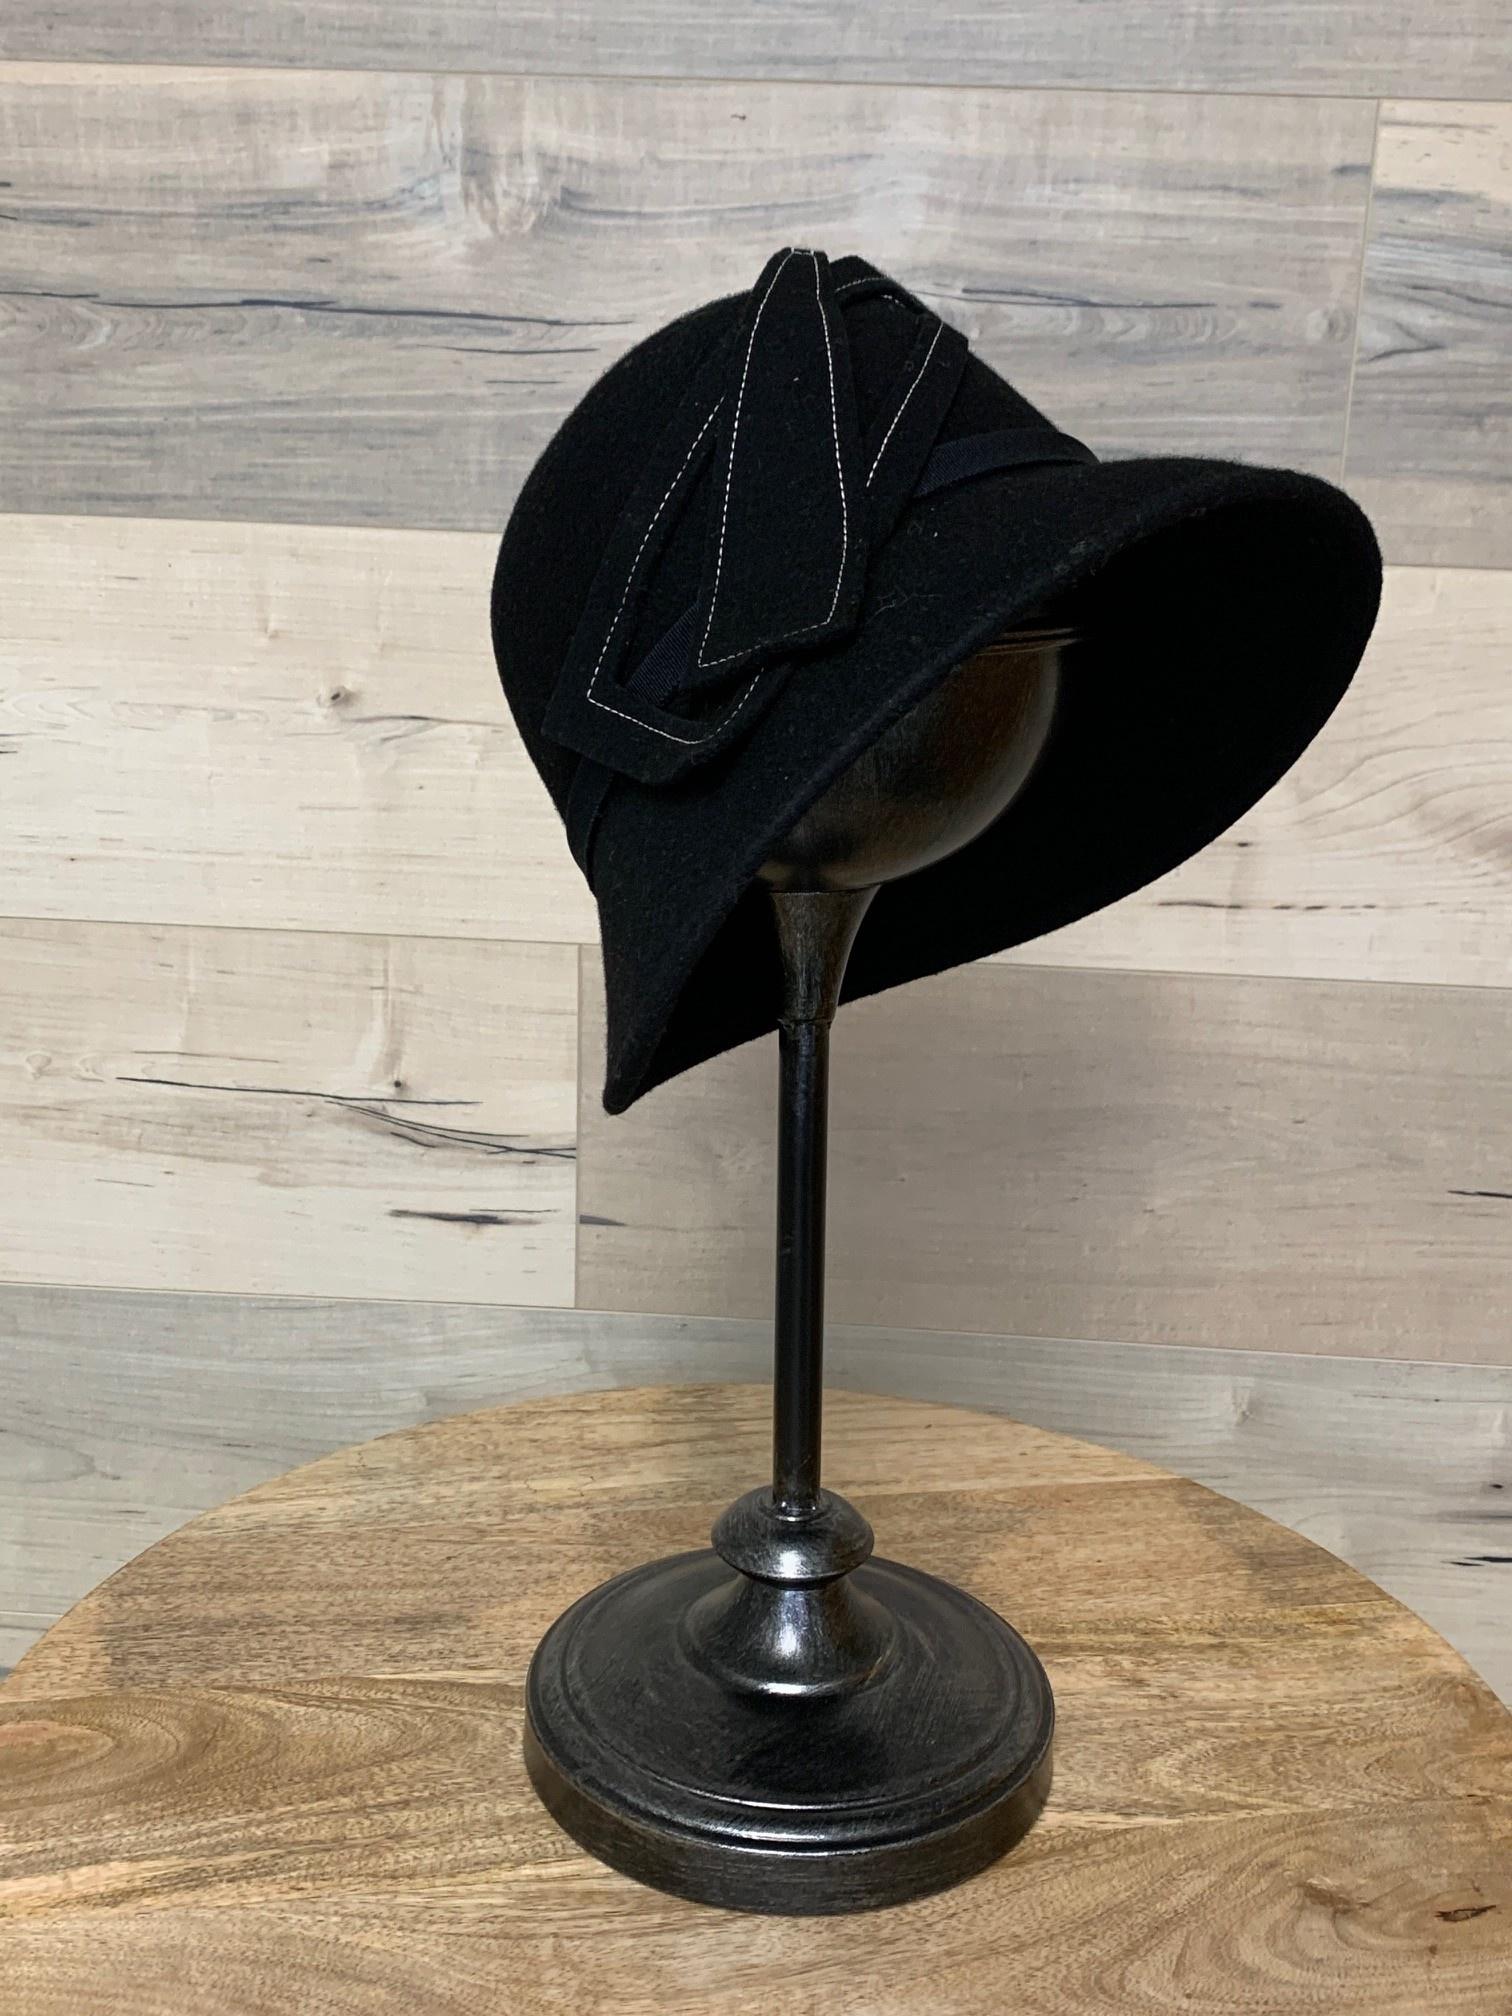 Black Cloche with White Stitching